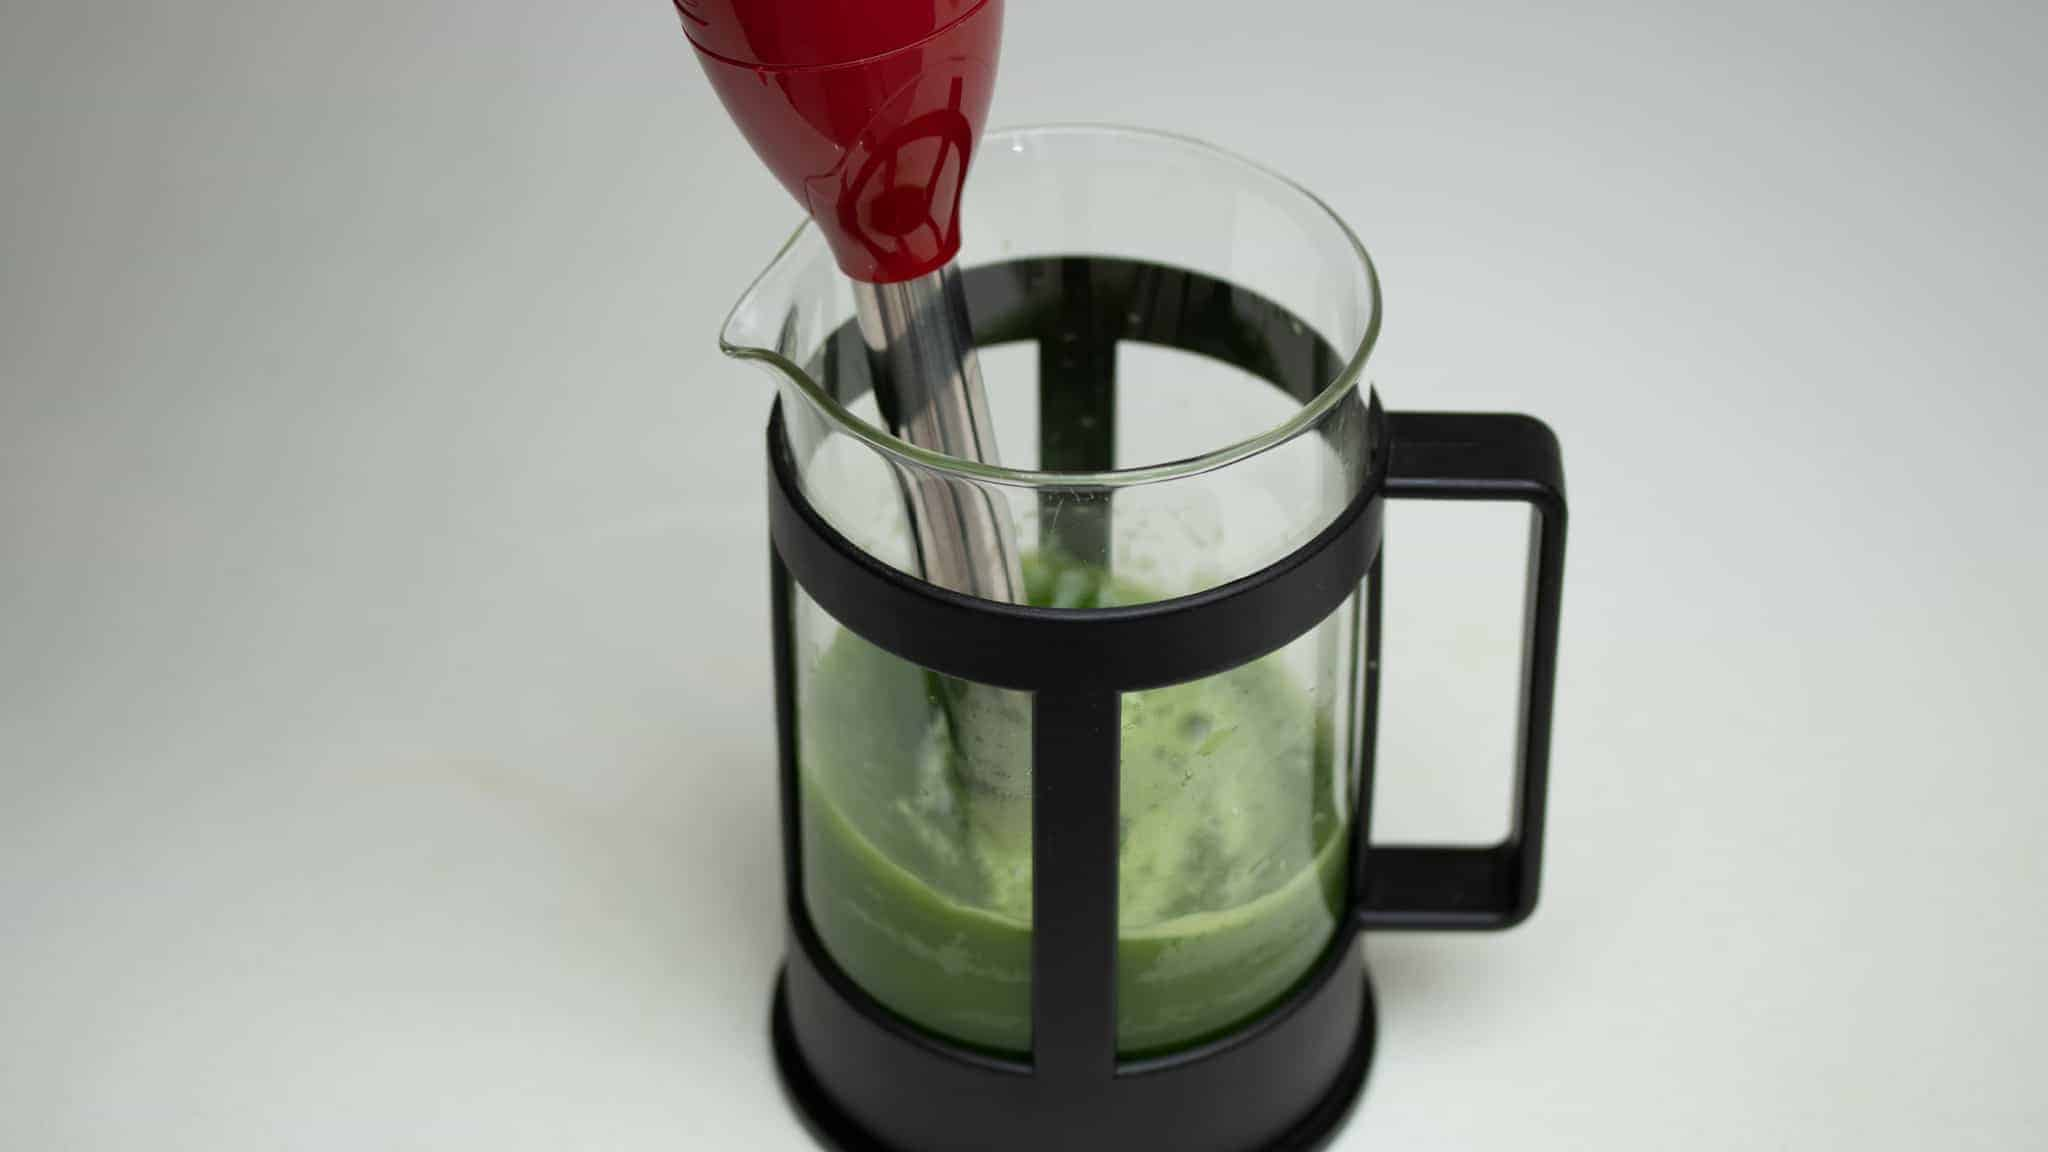 making matcha tea with immersion blender